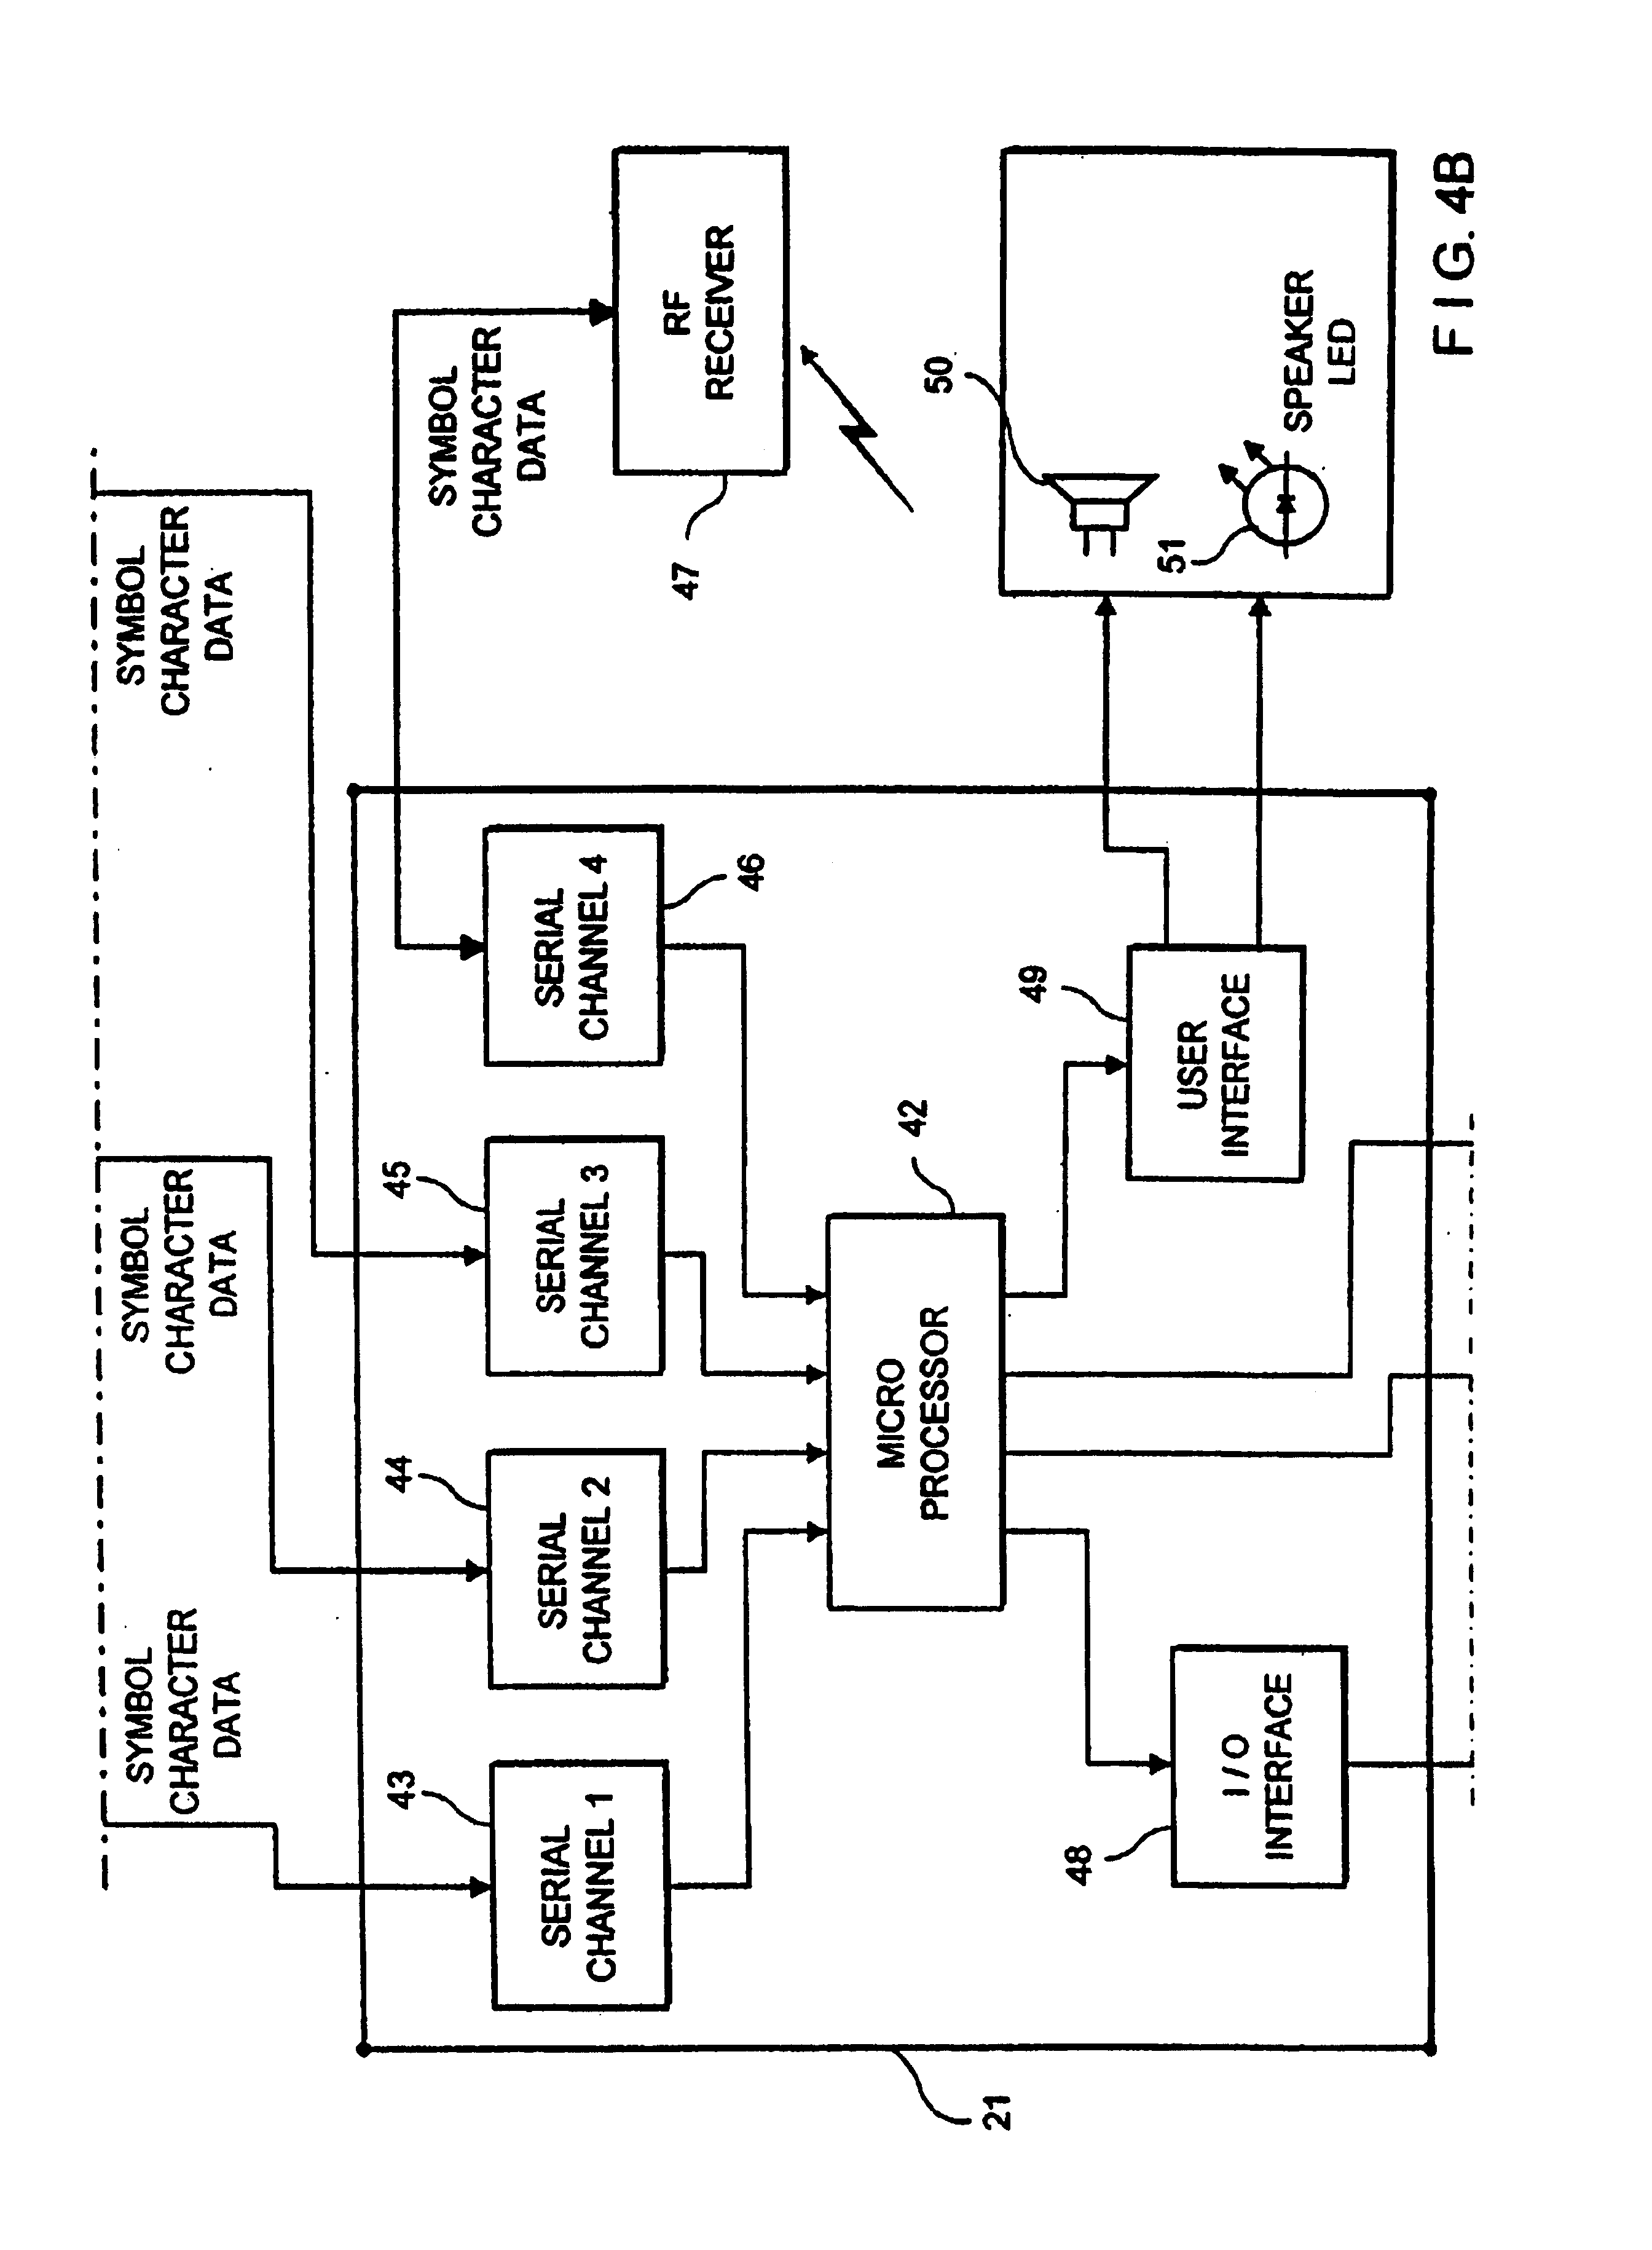 Patent Us 6953153 B2 Leddriven Led Display Circuit Design Powersupplycircuit